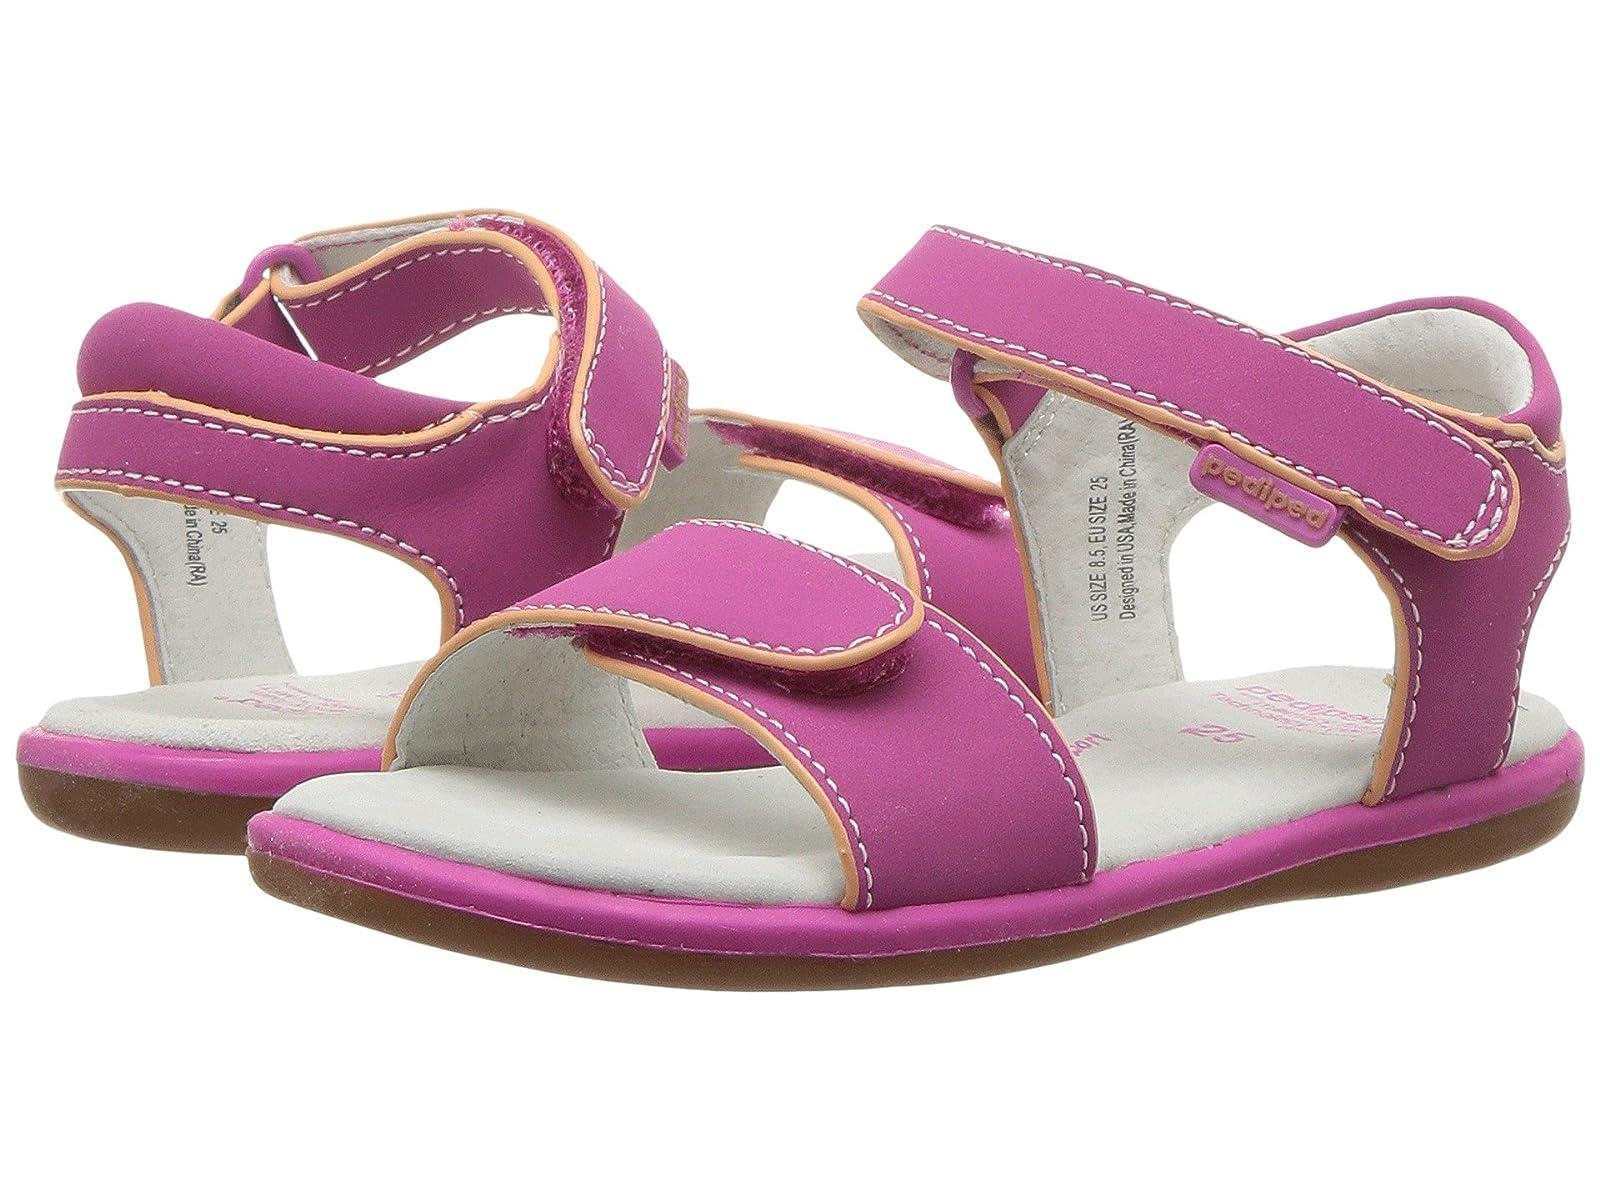 pediped Leana Flex (Toddler/Little Kid)Atmospheric grades have affordable shoes